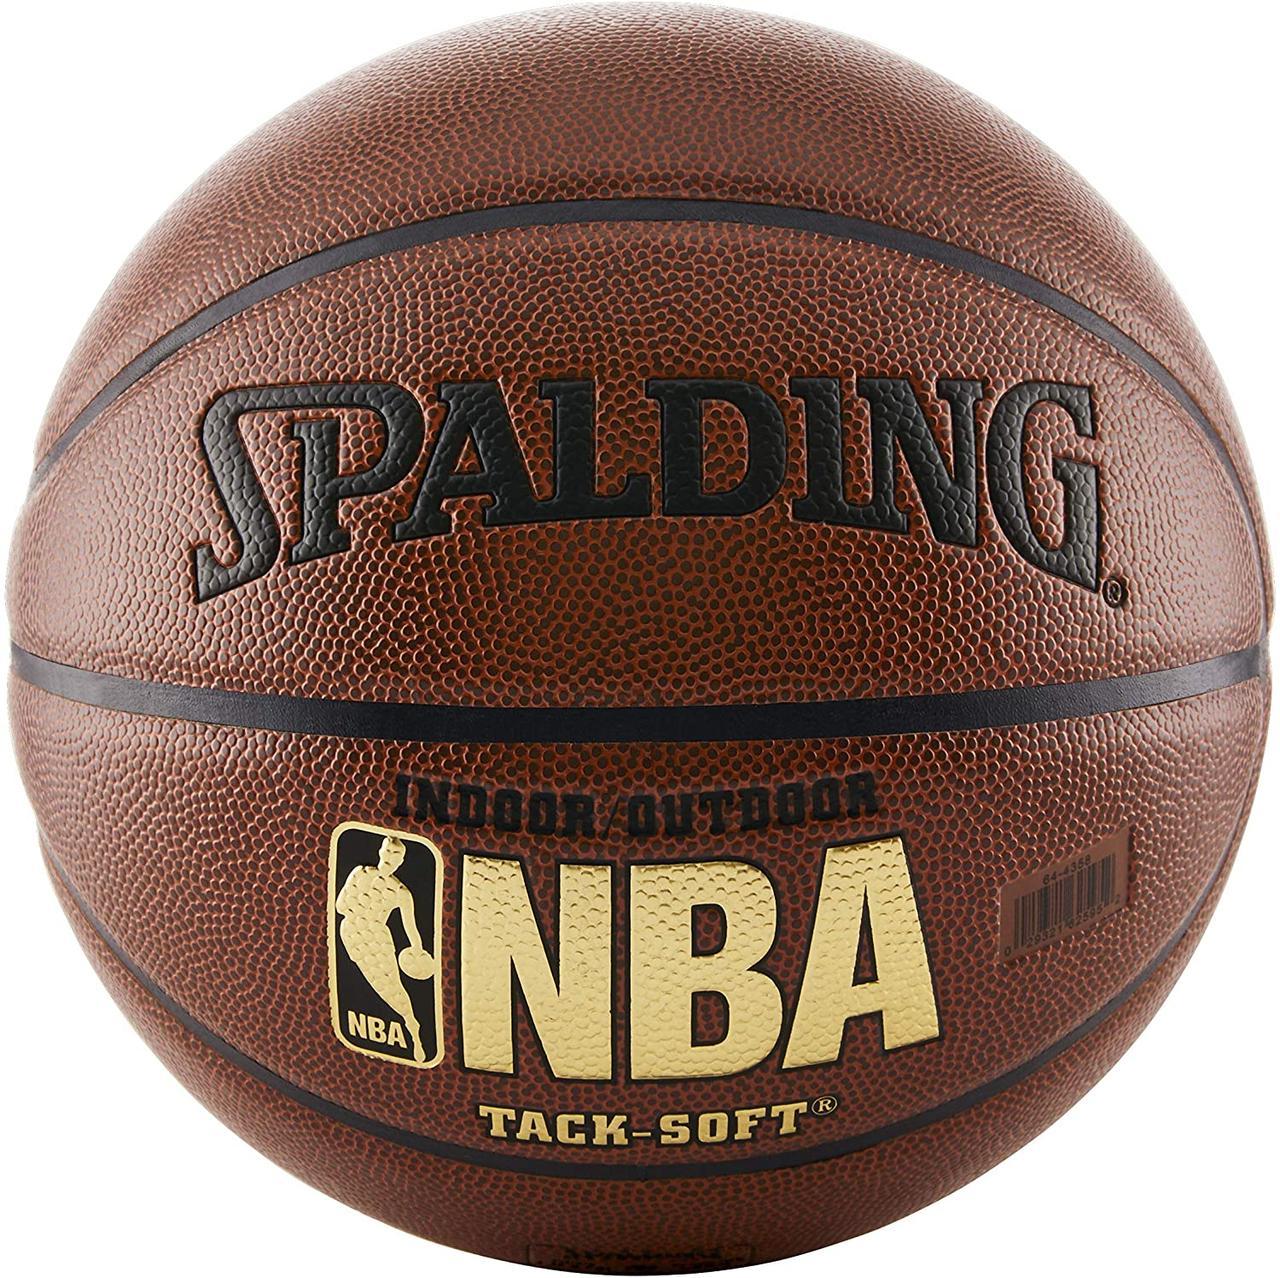 Баскетбольный мяч Spalding NBA Tack-Soft IndoorOutdoor Basketball размер 7 Оригинал